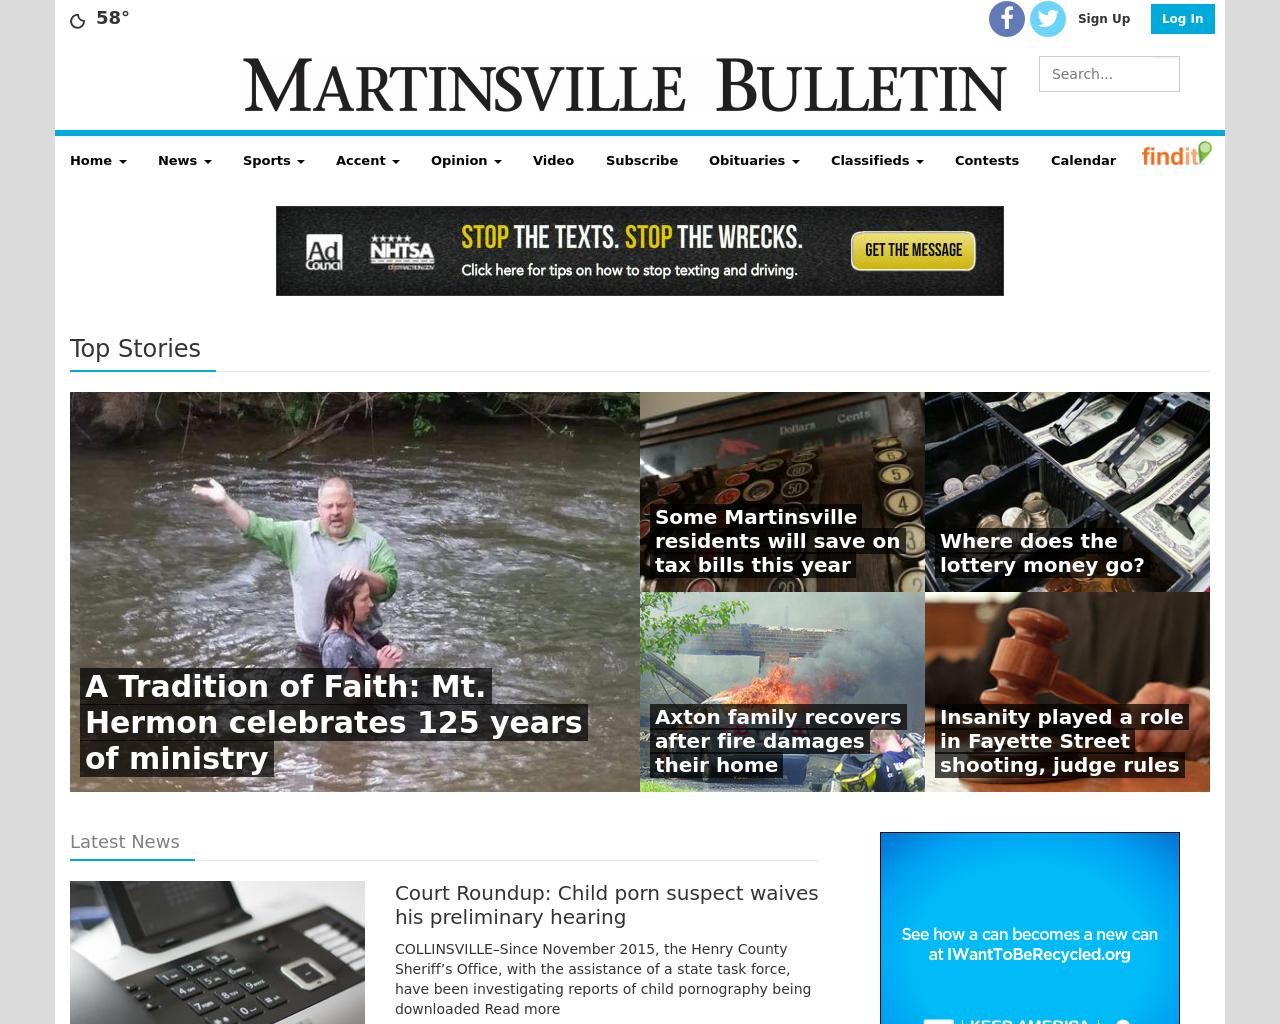 Martinsville-Bulletin-Advertising-Reviews-Pricing